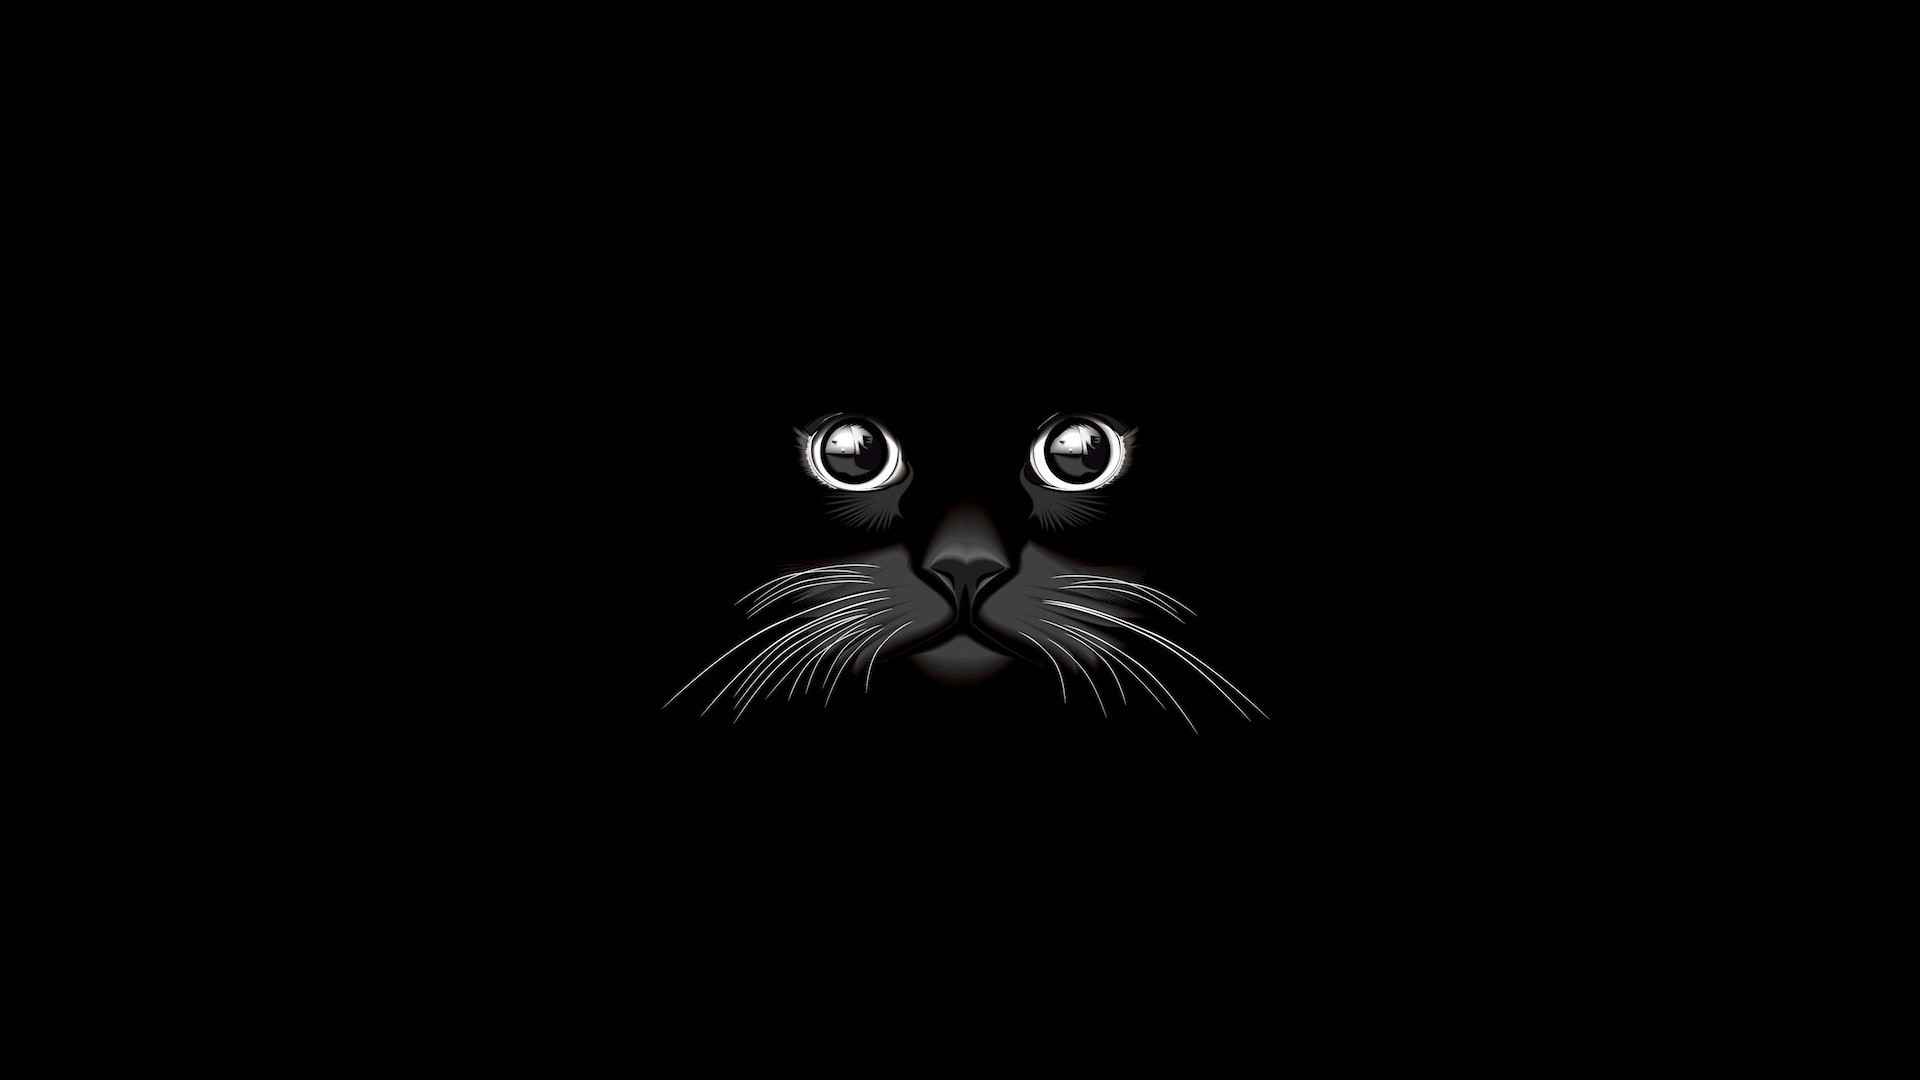 Black Cat Background 65 Images